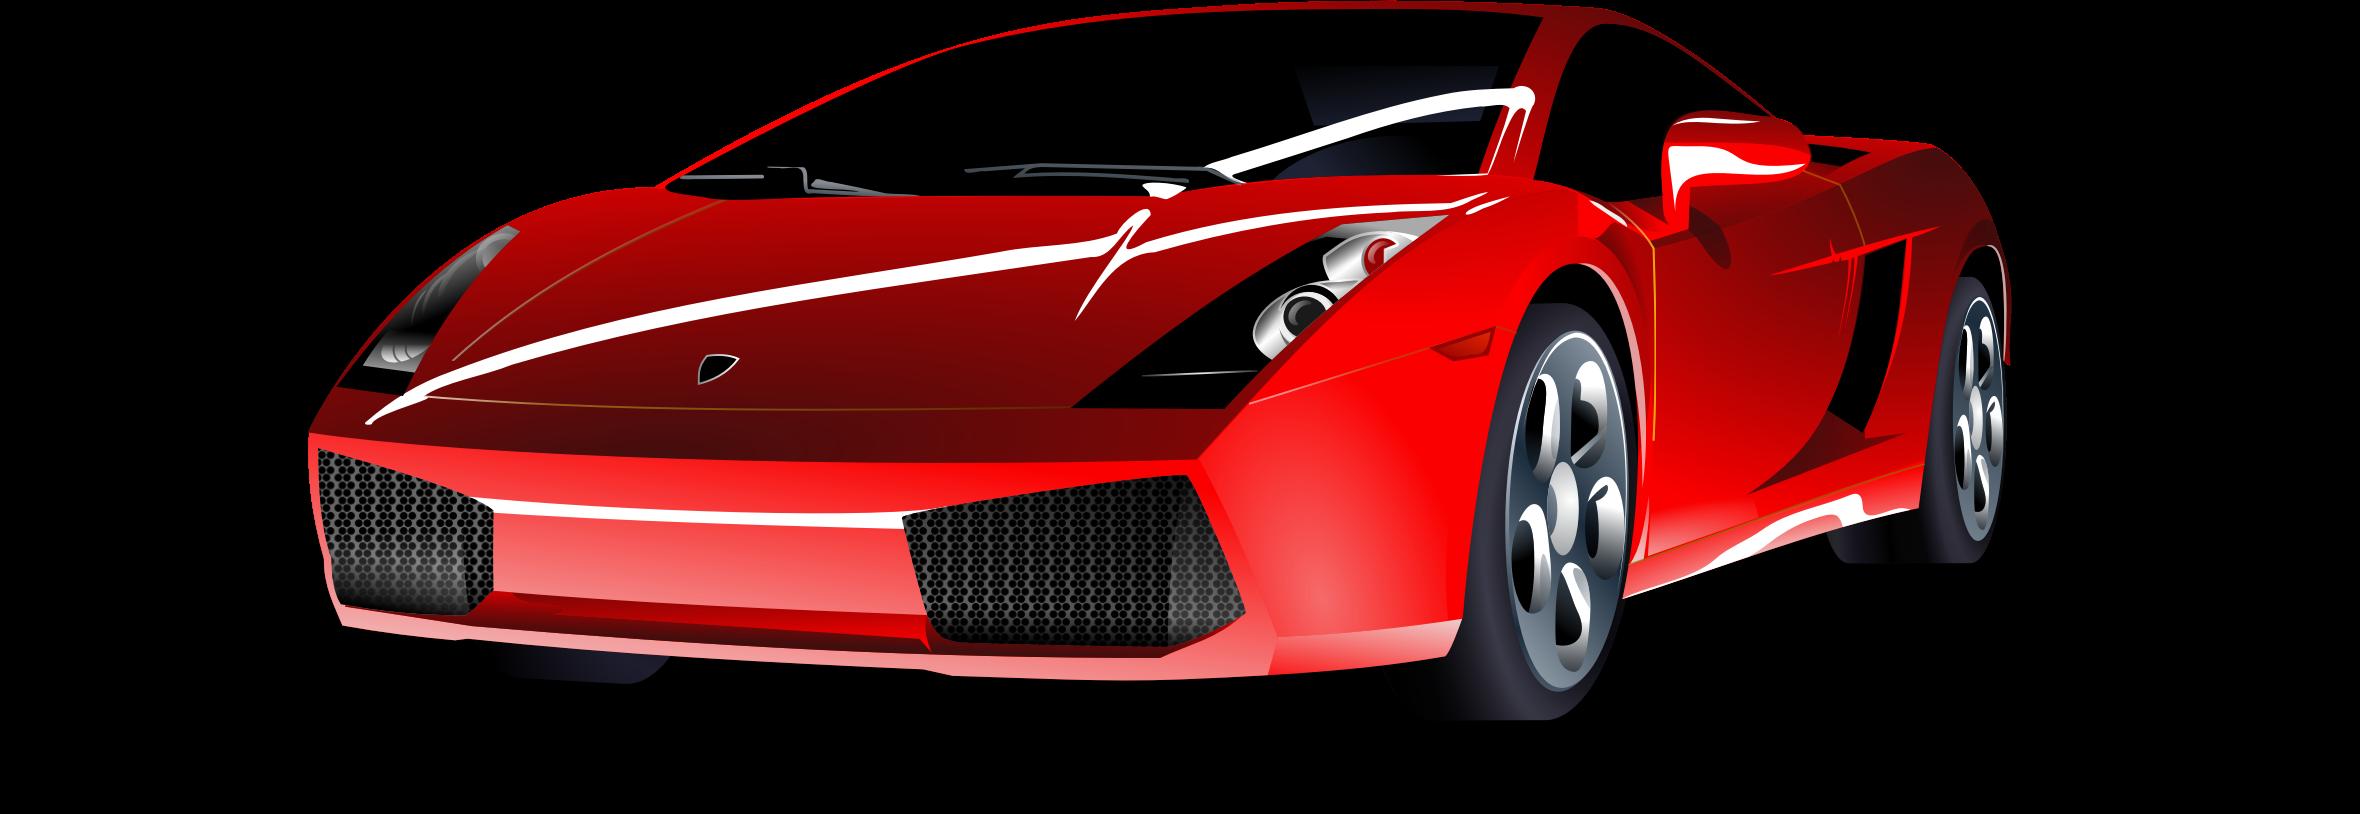 Ferrari clipart kid car Cliparts car Clipart car clipart